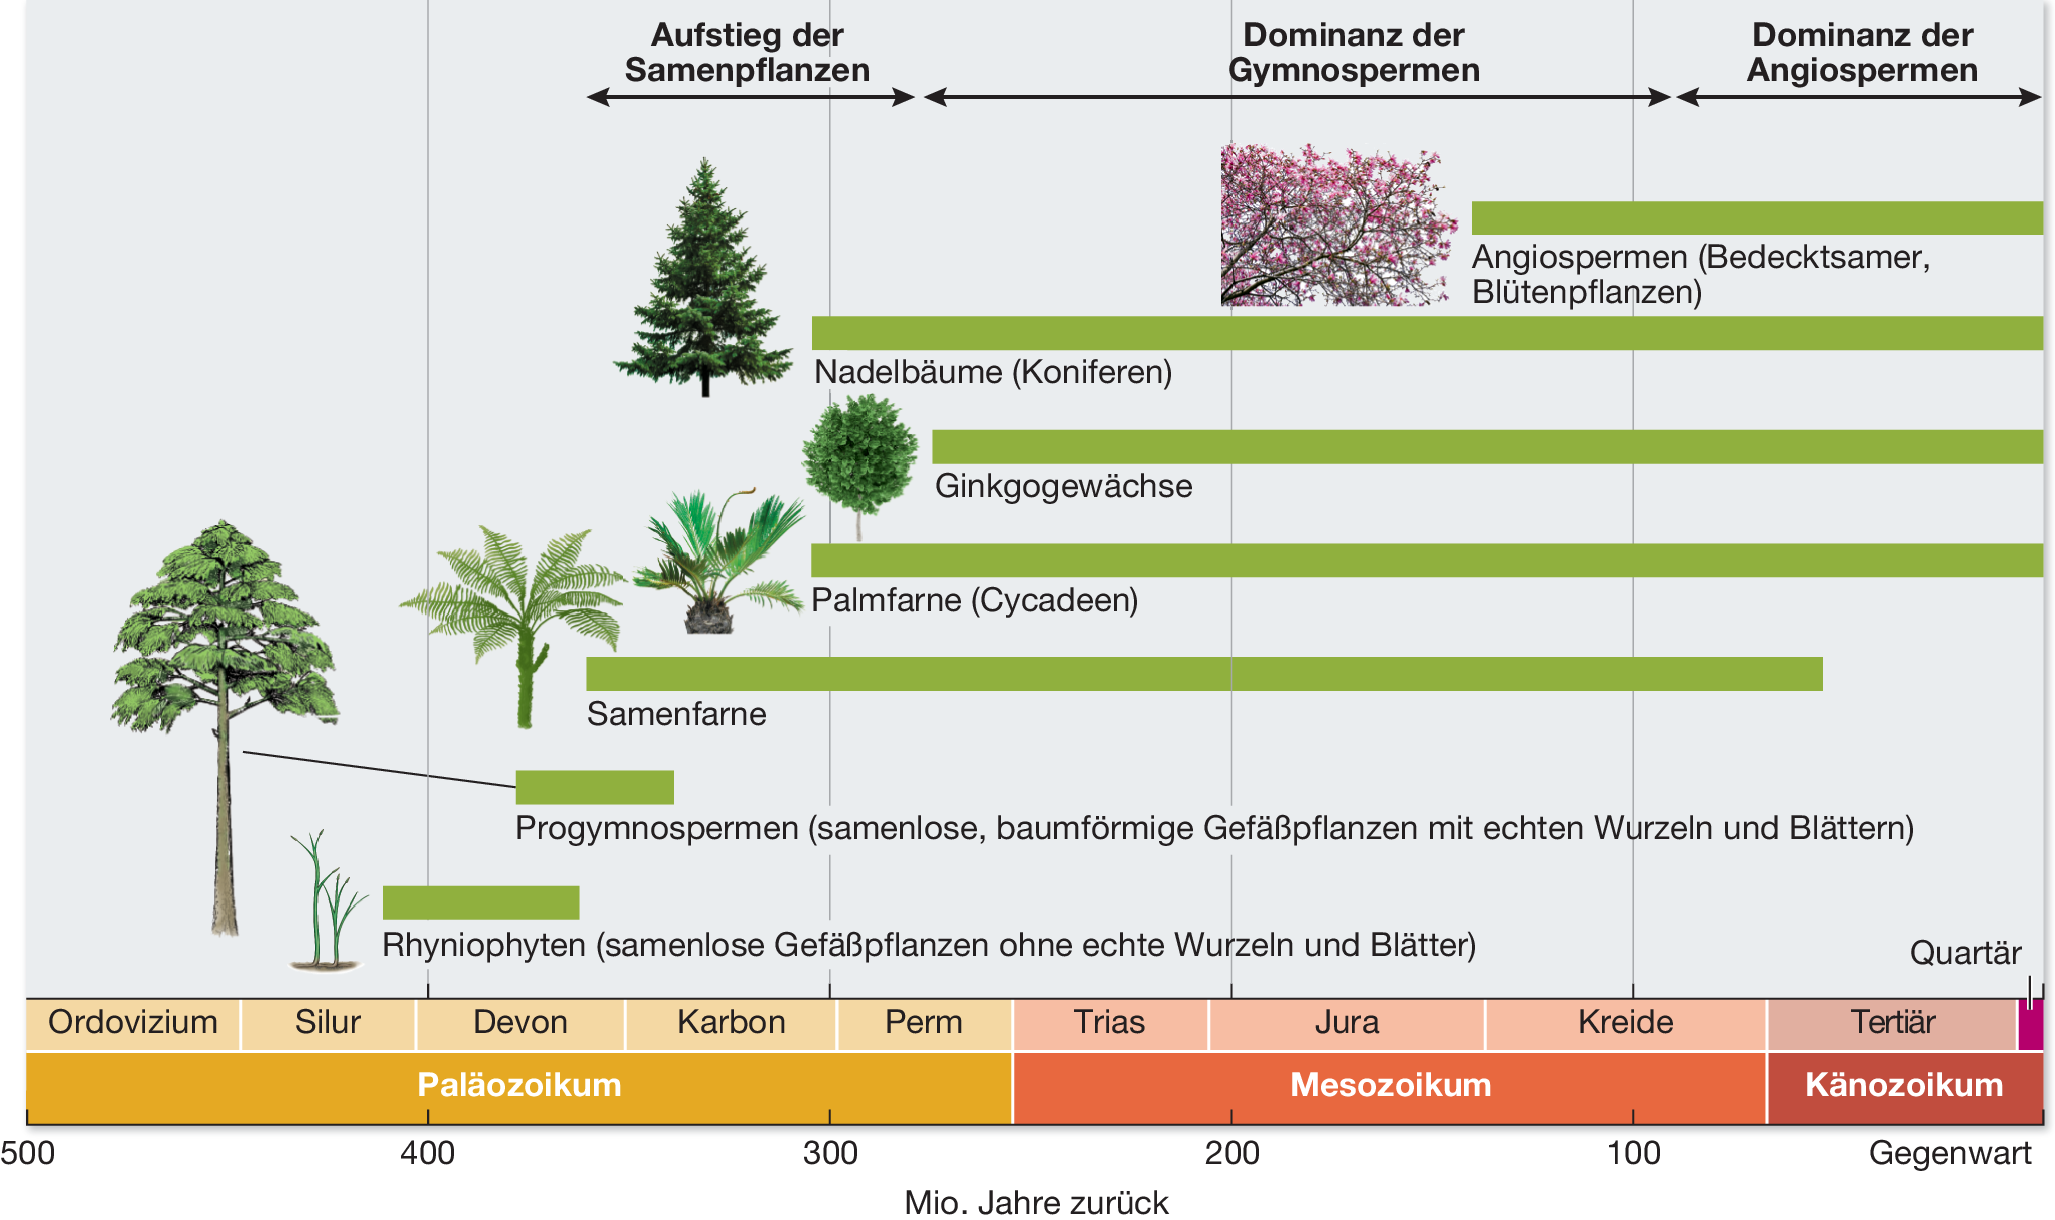 Mediendatenbank Biologie Merkmale Der Samenpflanzen